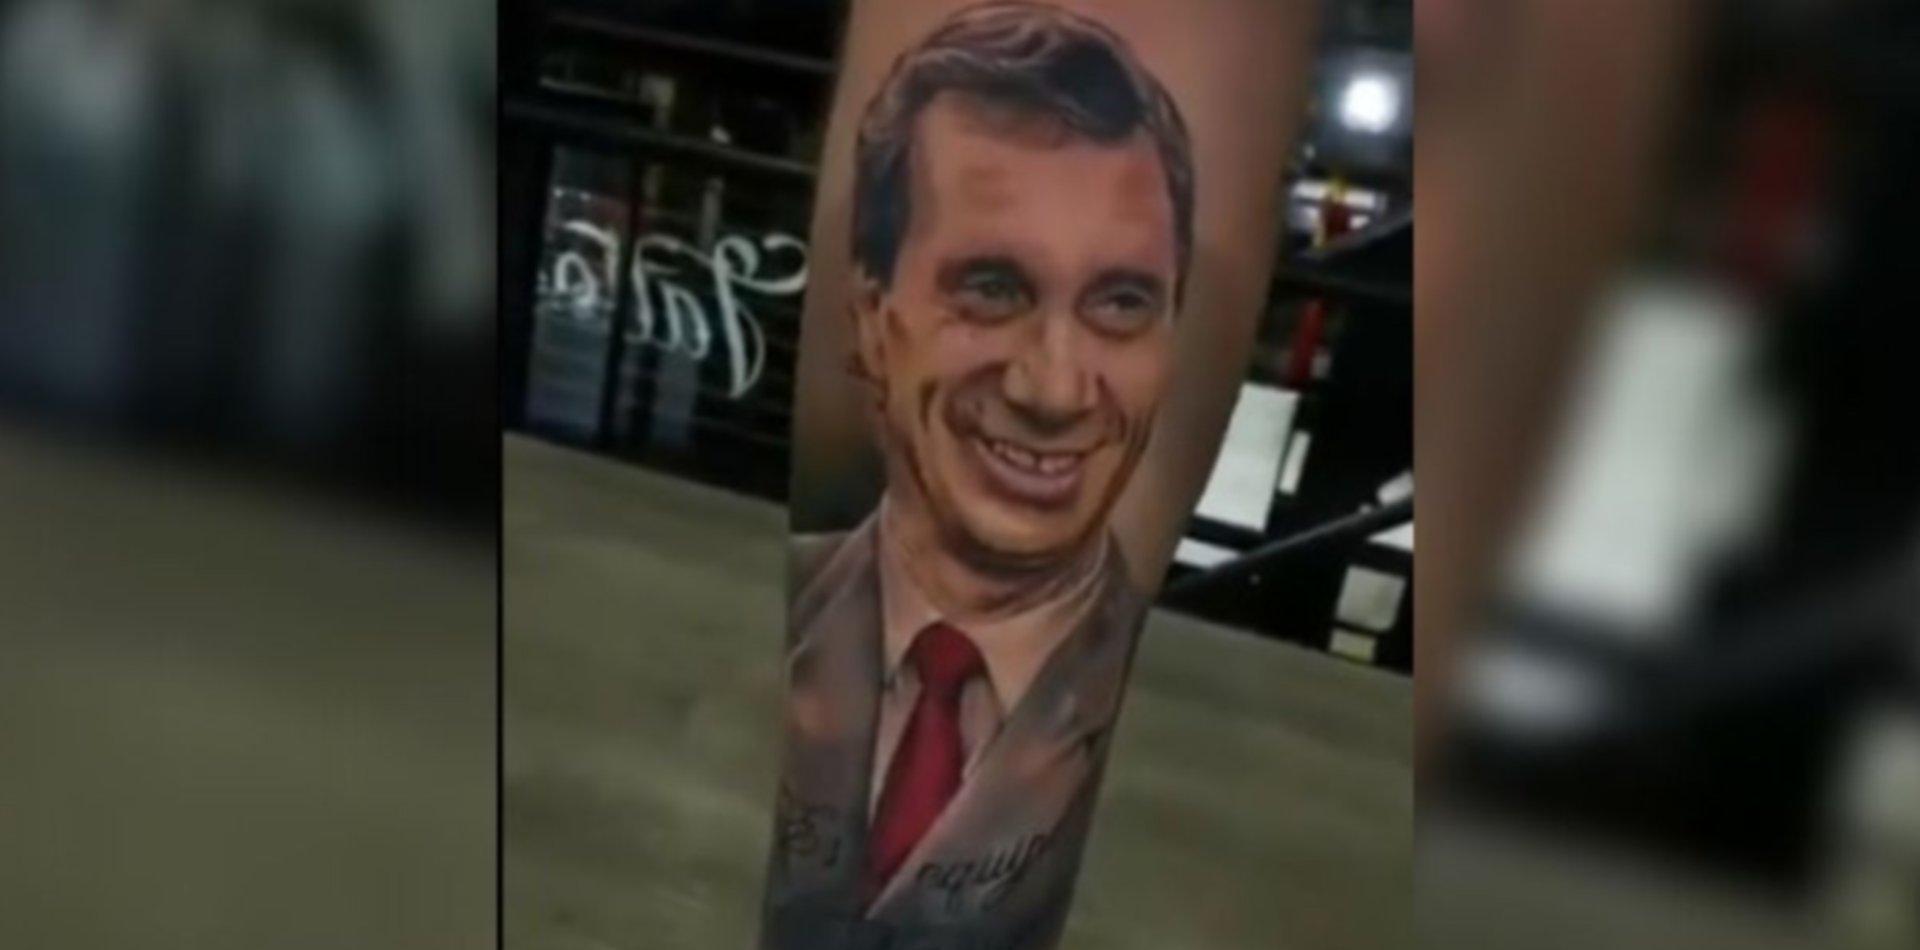 VIDEO: El impactante tatuaje de Carlos Bilardo que se hizo viral